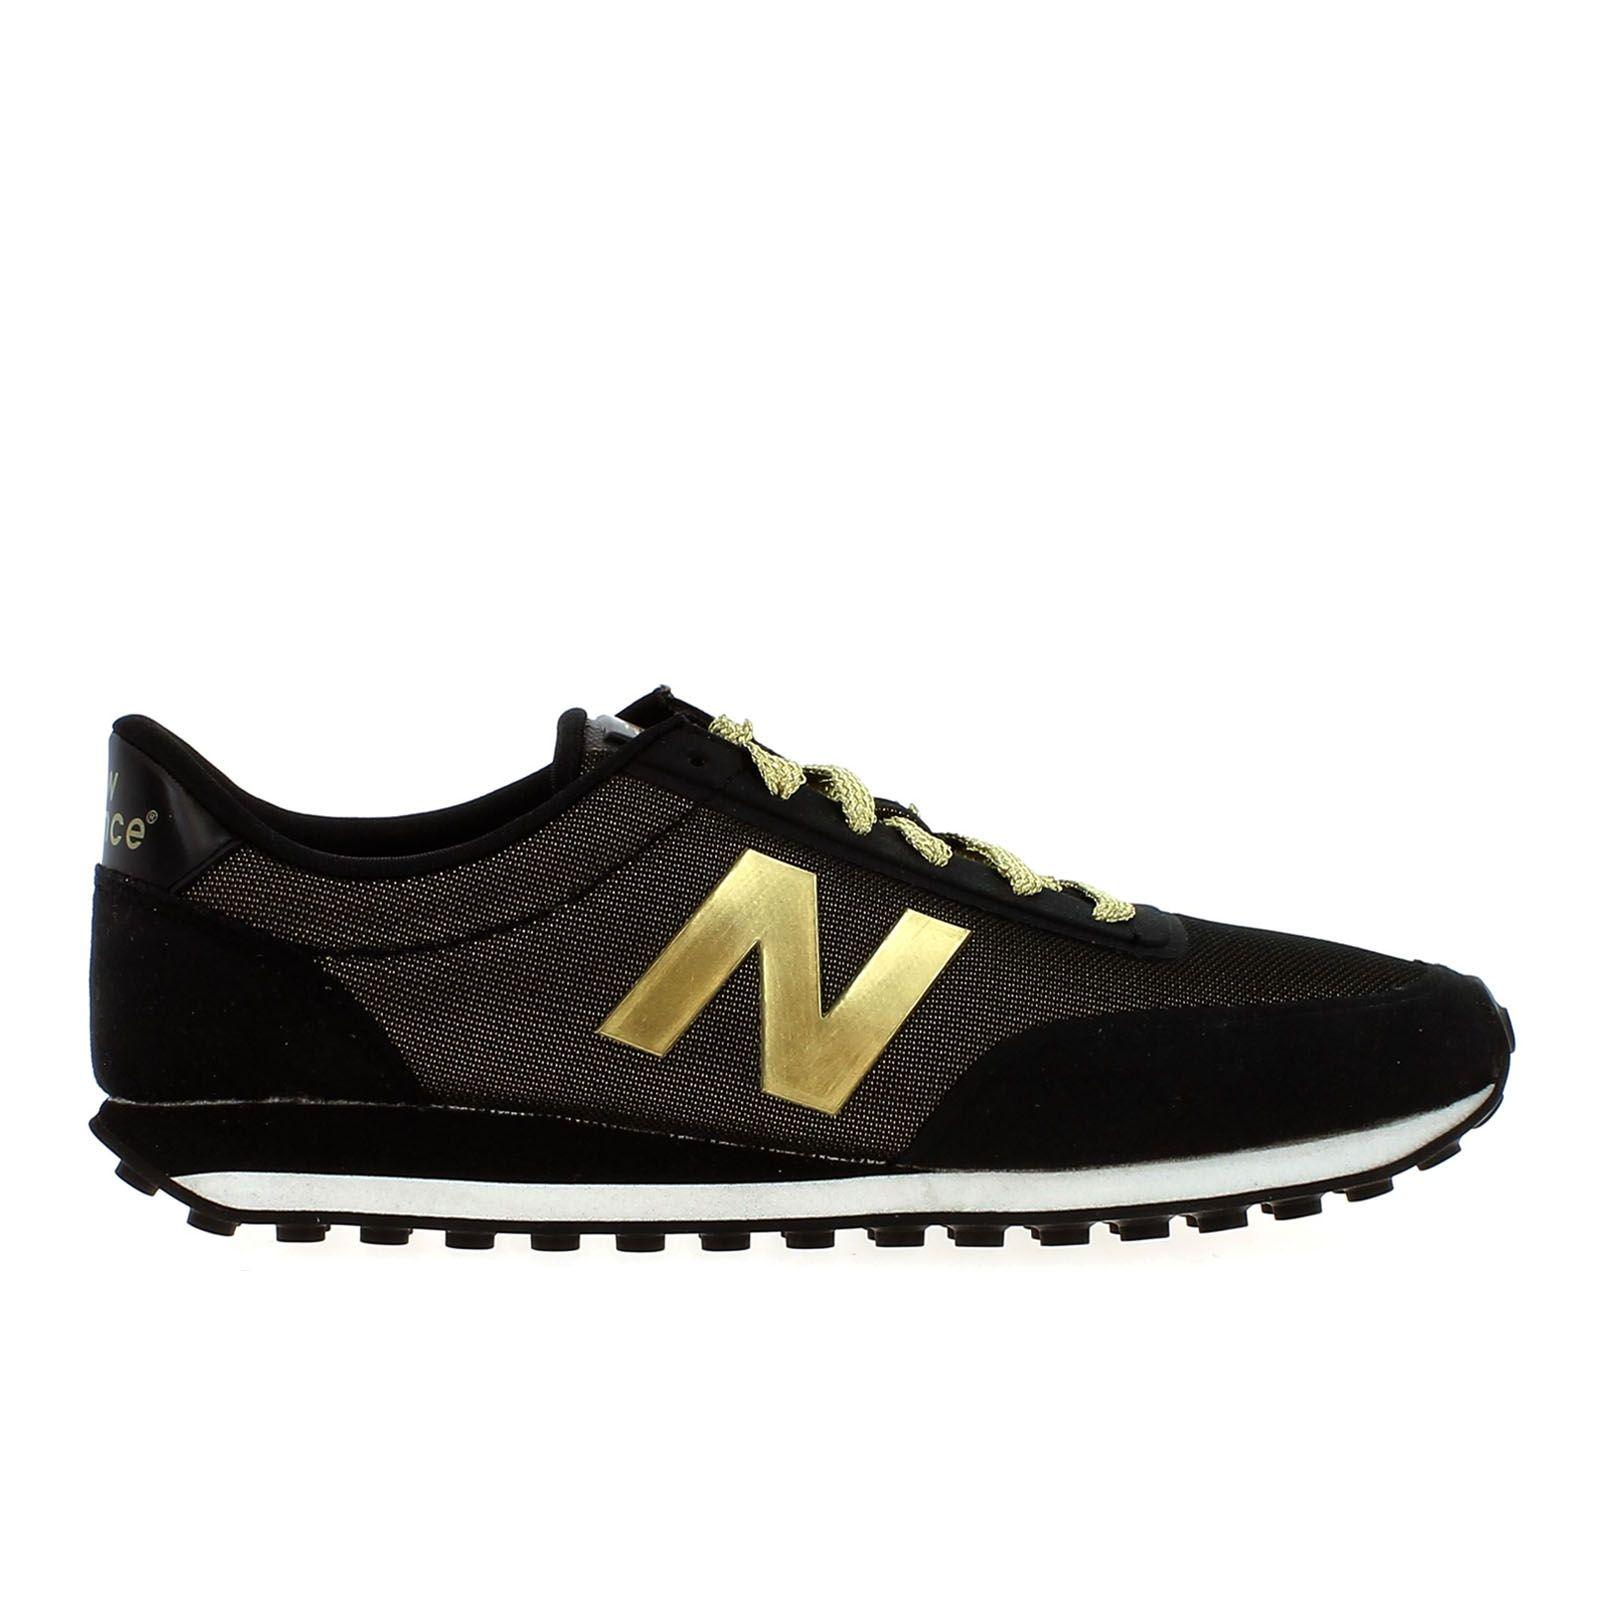 New Balance Wl410 Noir Or